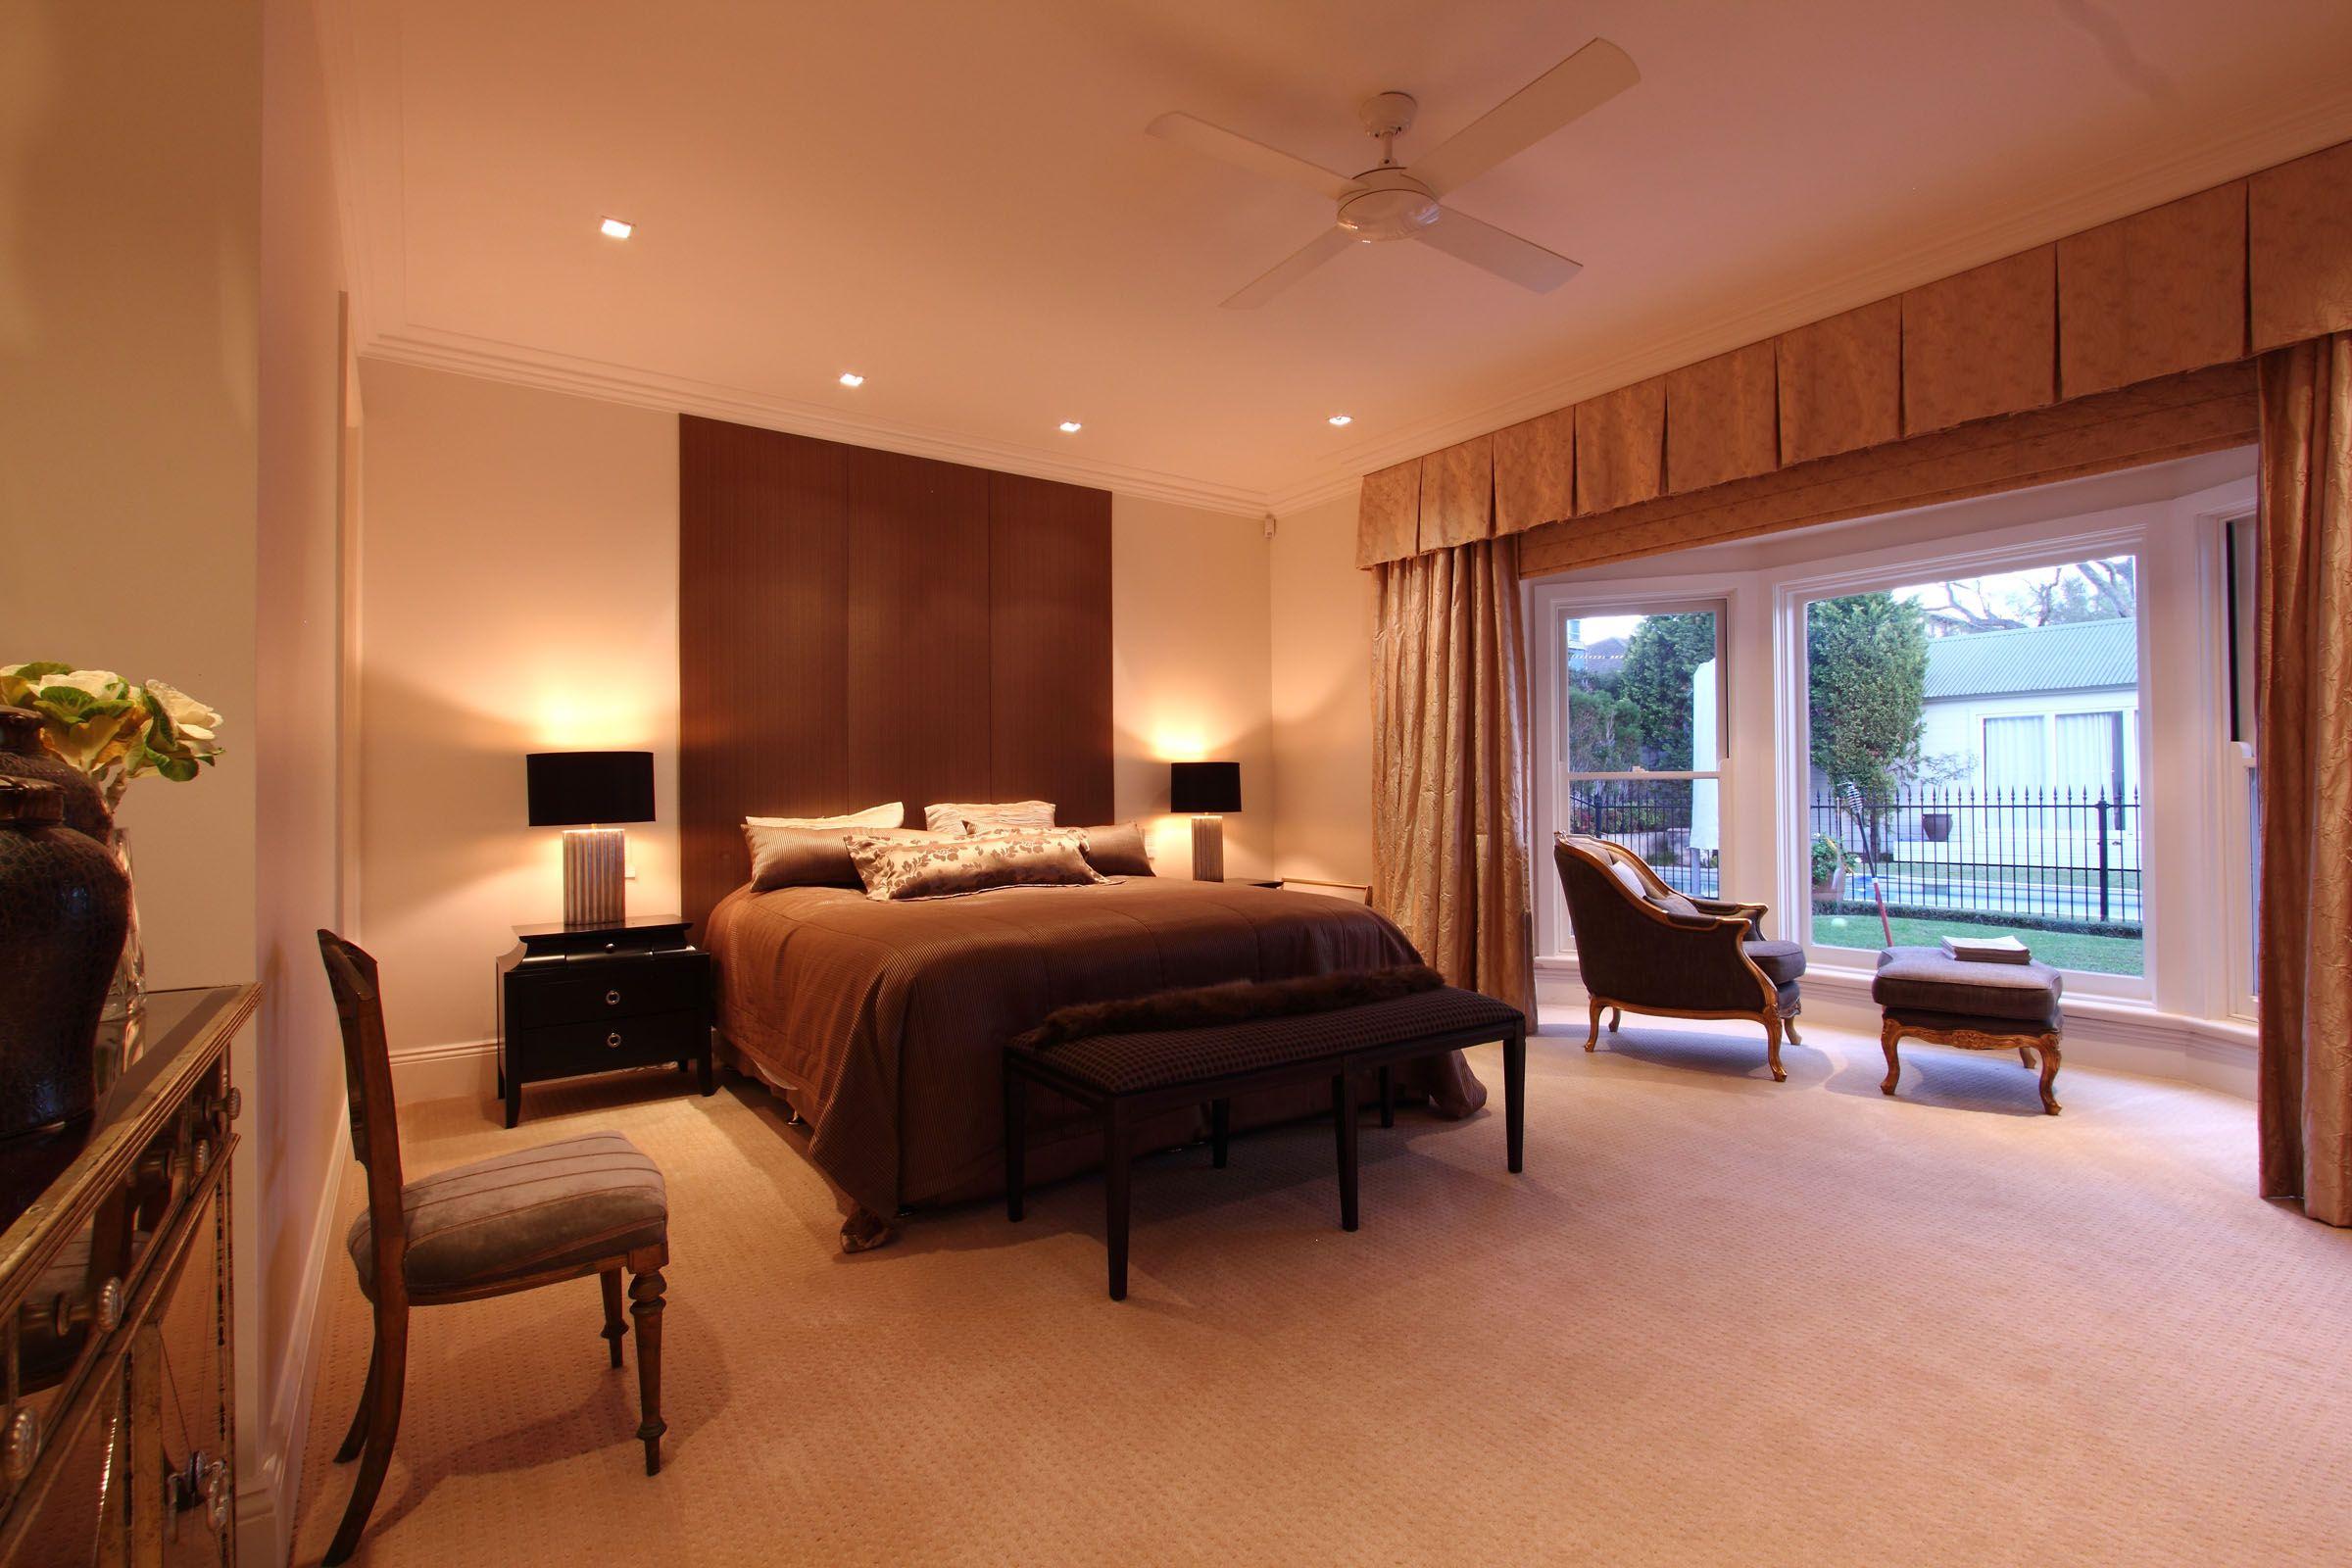 #Bedroom #Upholsteredheadboard #Curtains #Pelmet Interesting, Inspiring And Individual Family Homes